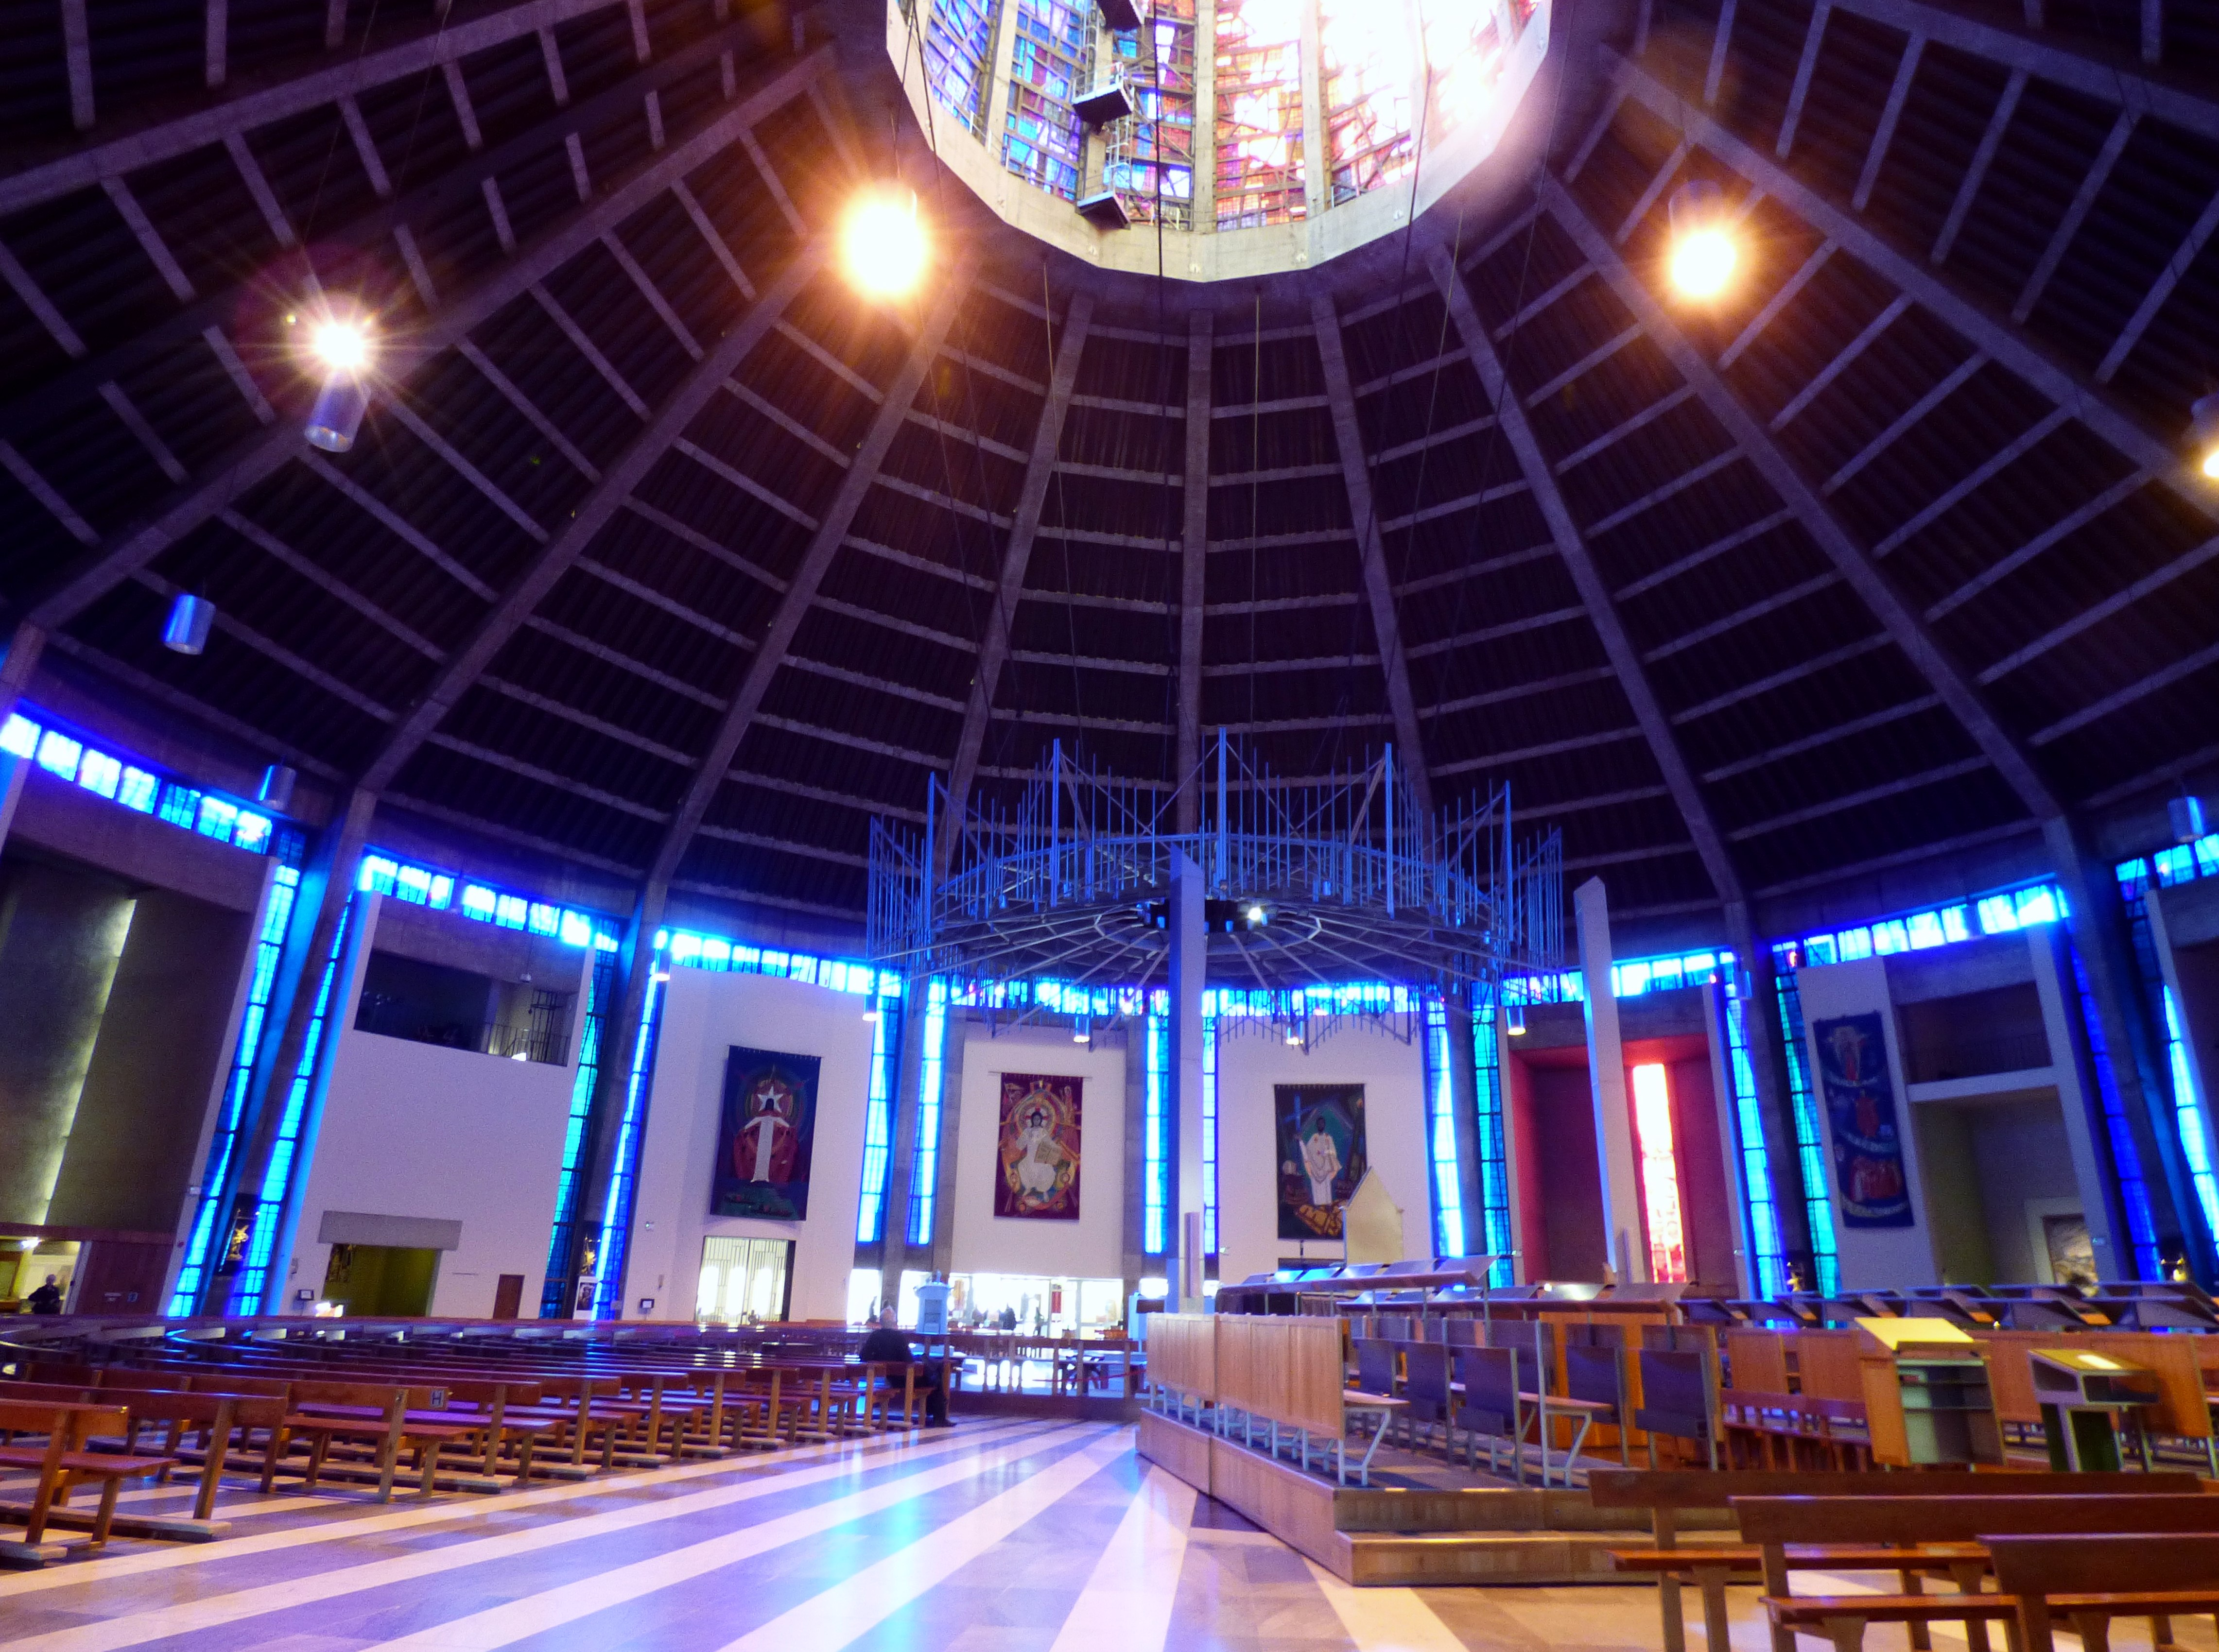 interior of Liverpool Metropolitan Cathedral